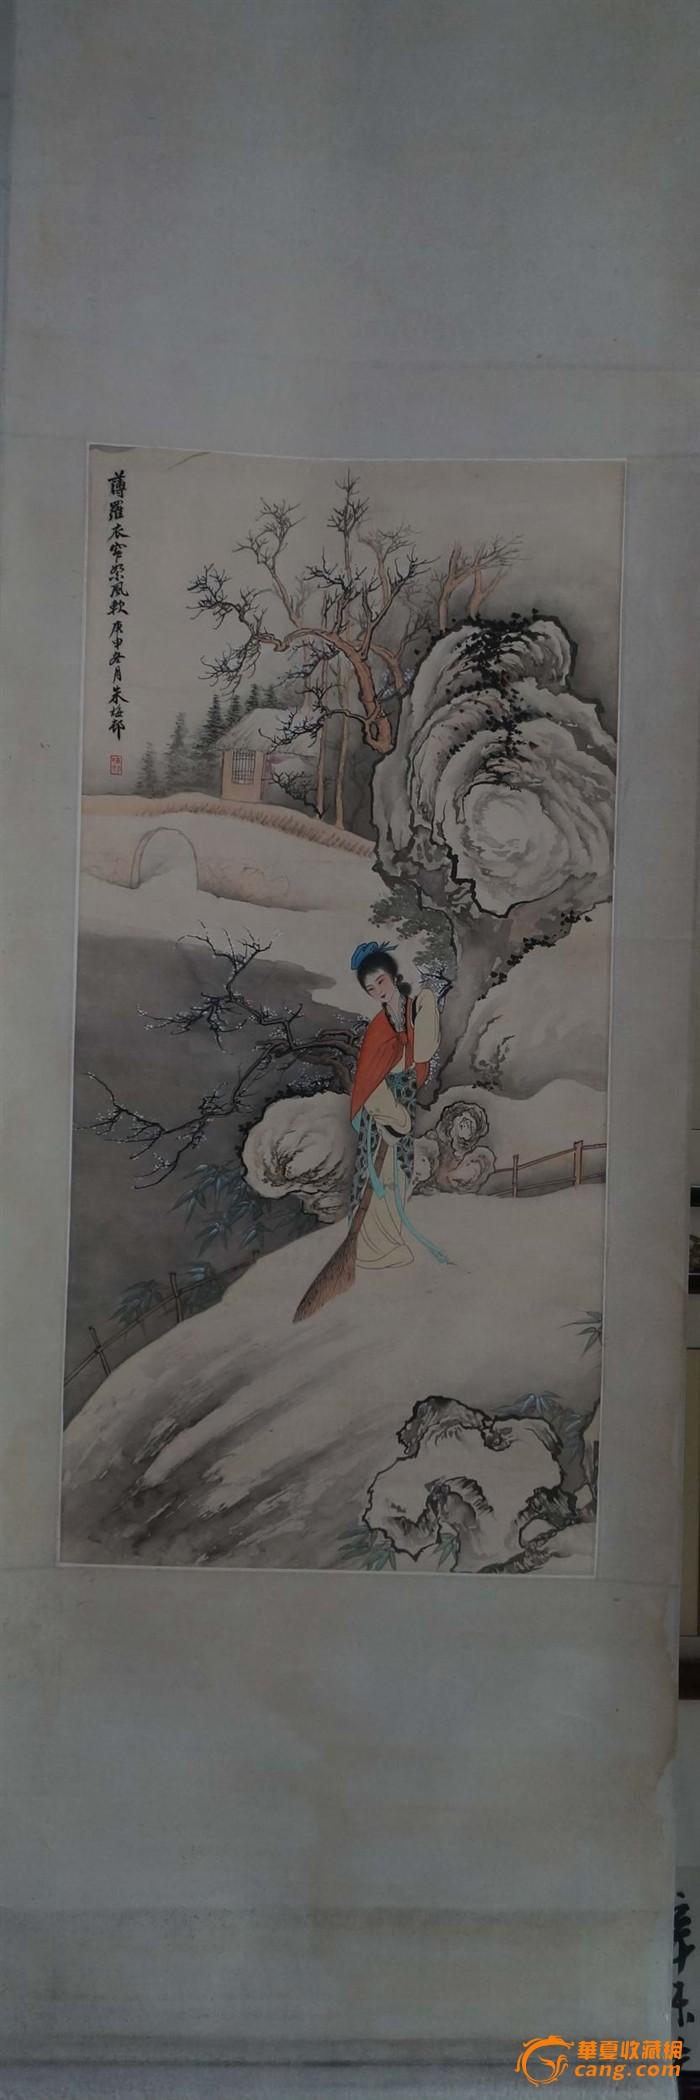 朱梅村_a446号:朱梅村 人物仕女(原装旧裱)